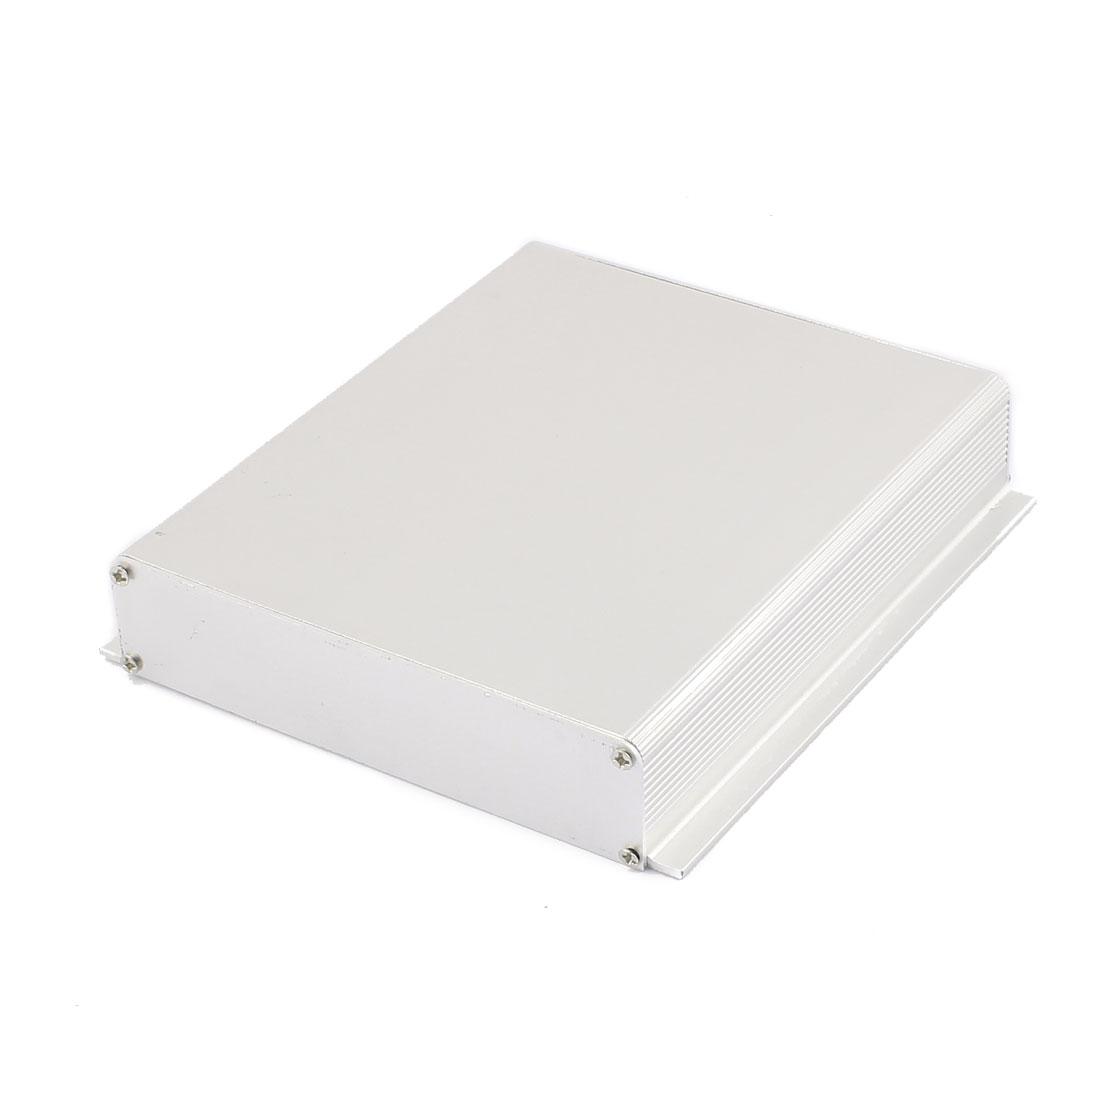 164 x 155 x 33mm Multi-purpose Electronic Extruded Aluminum Enclosure Silver Tone